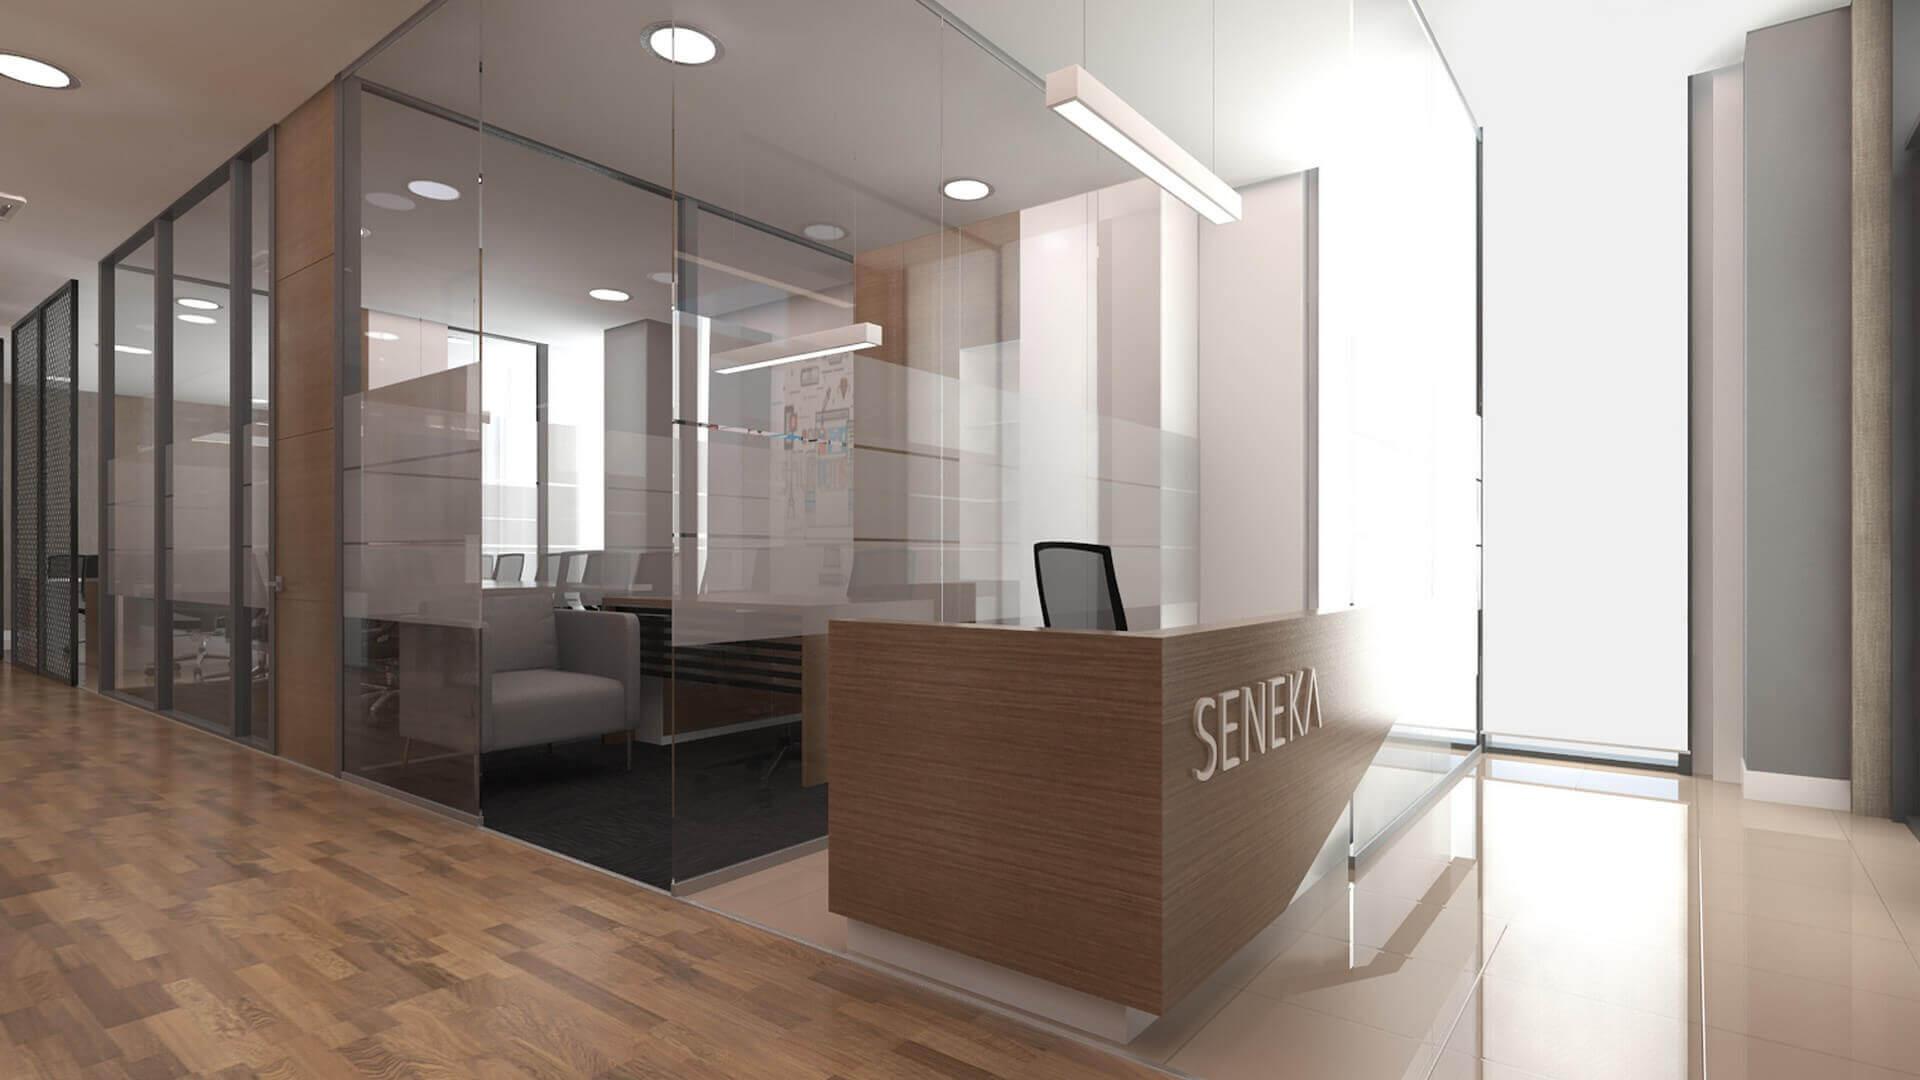 Cyberpark 2699 Seneka Software Offices